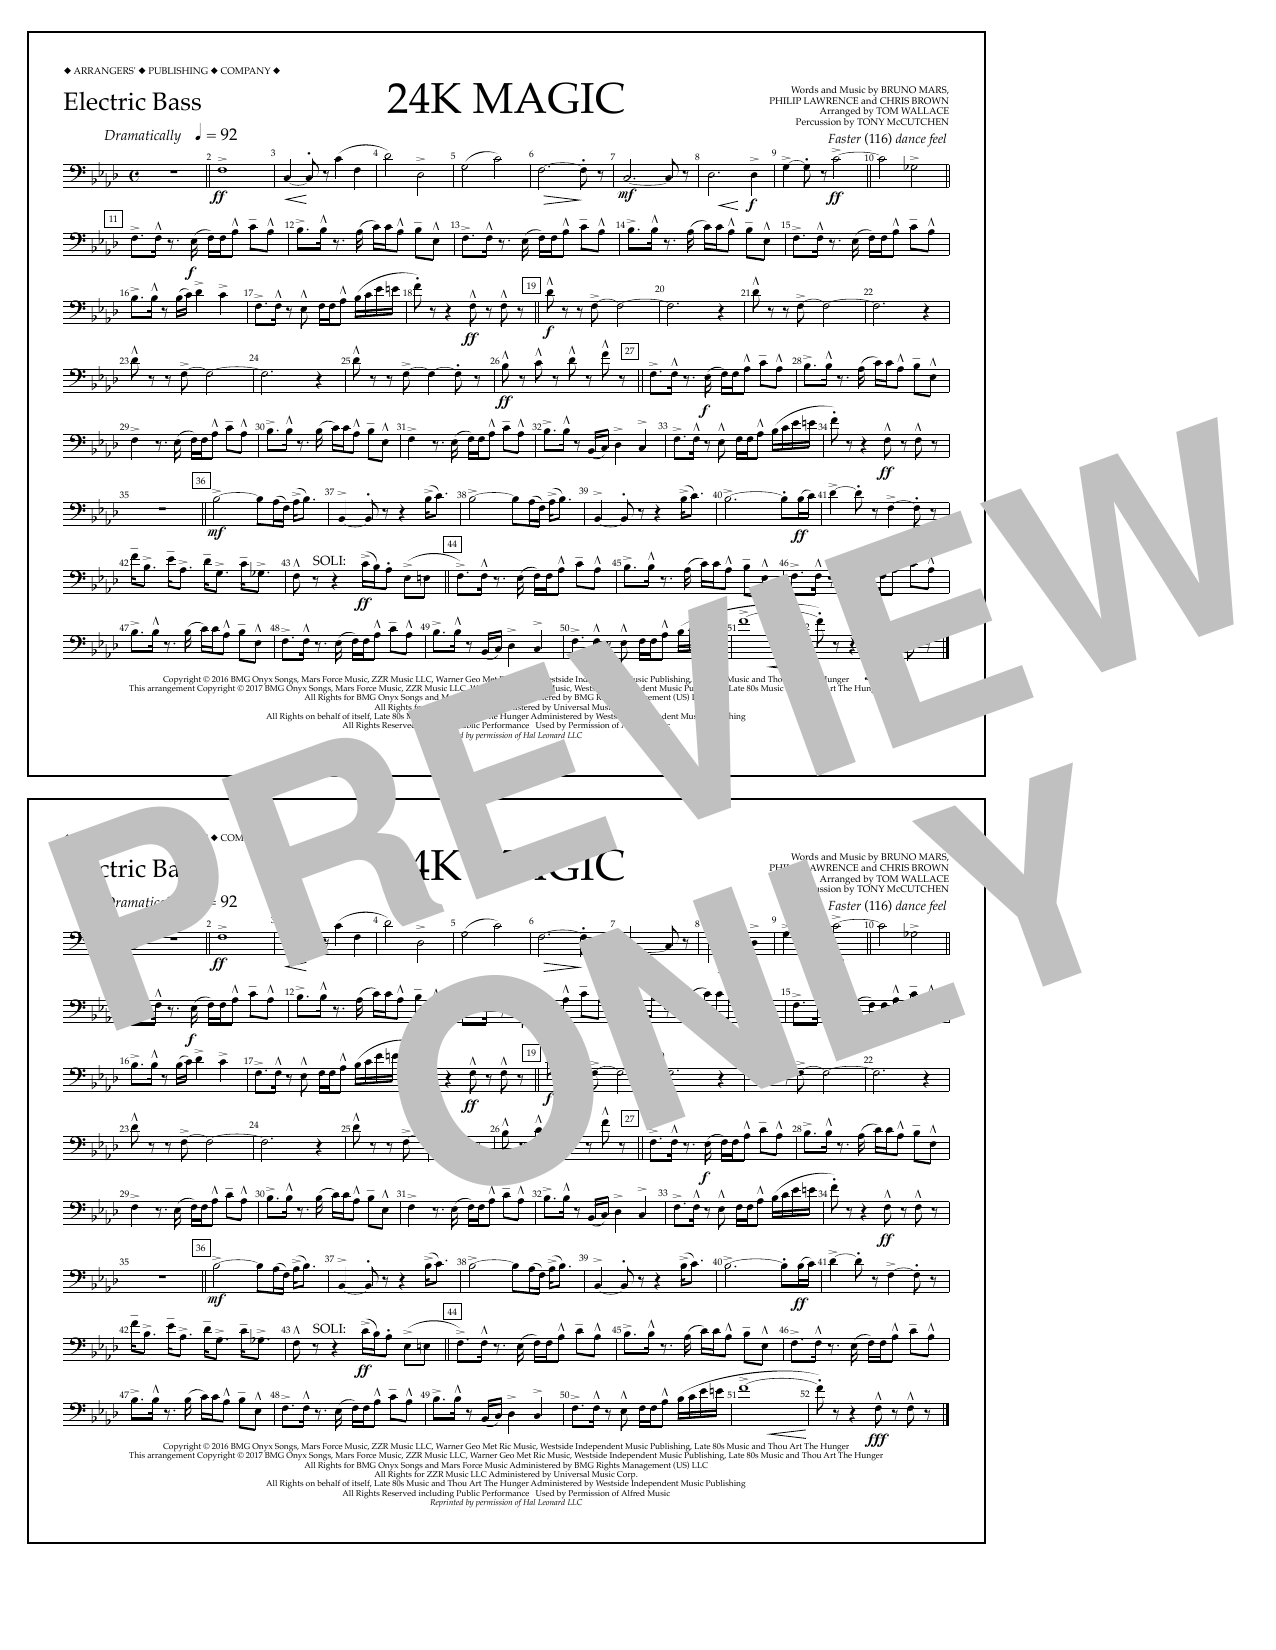 24K Magic - Electric Bass Sheet Music